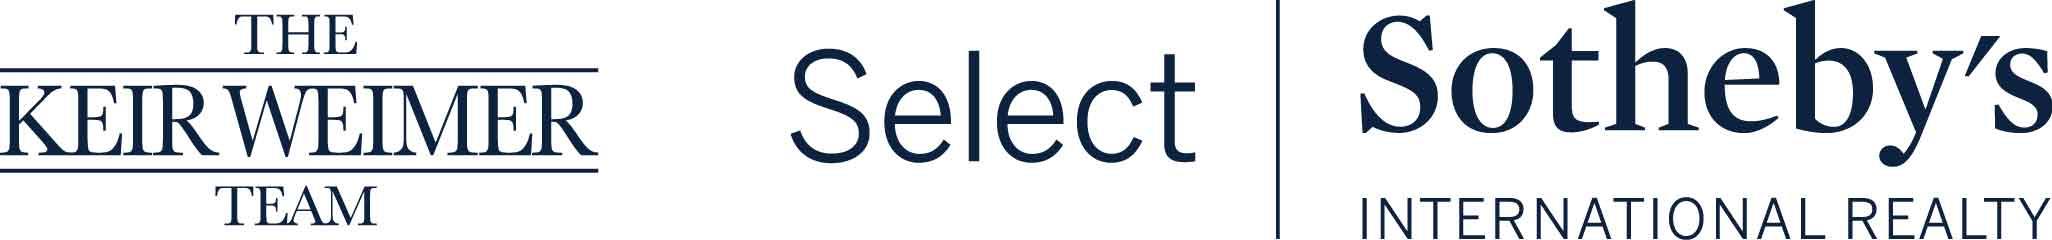 Select Sotheby's International Realty logo